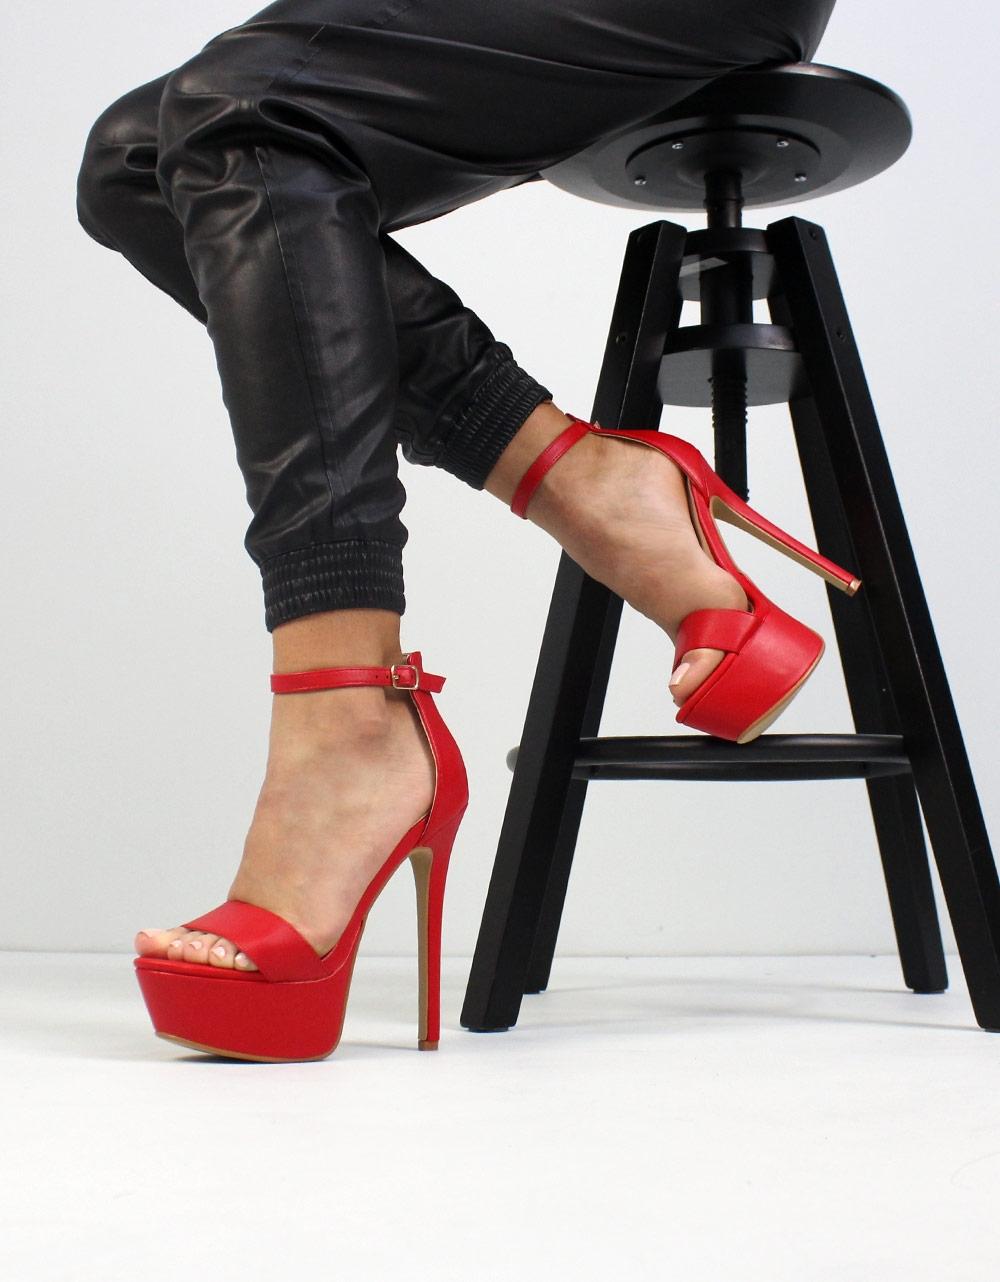 b259a13d7b9 Inshoes.gr. Γυναικεία πέδιλα ψηλοτάκουνα με φιάπα | Inshoes.gr Κόκκινο